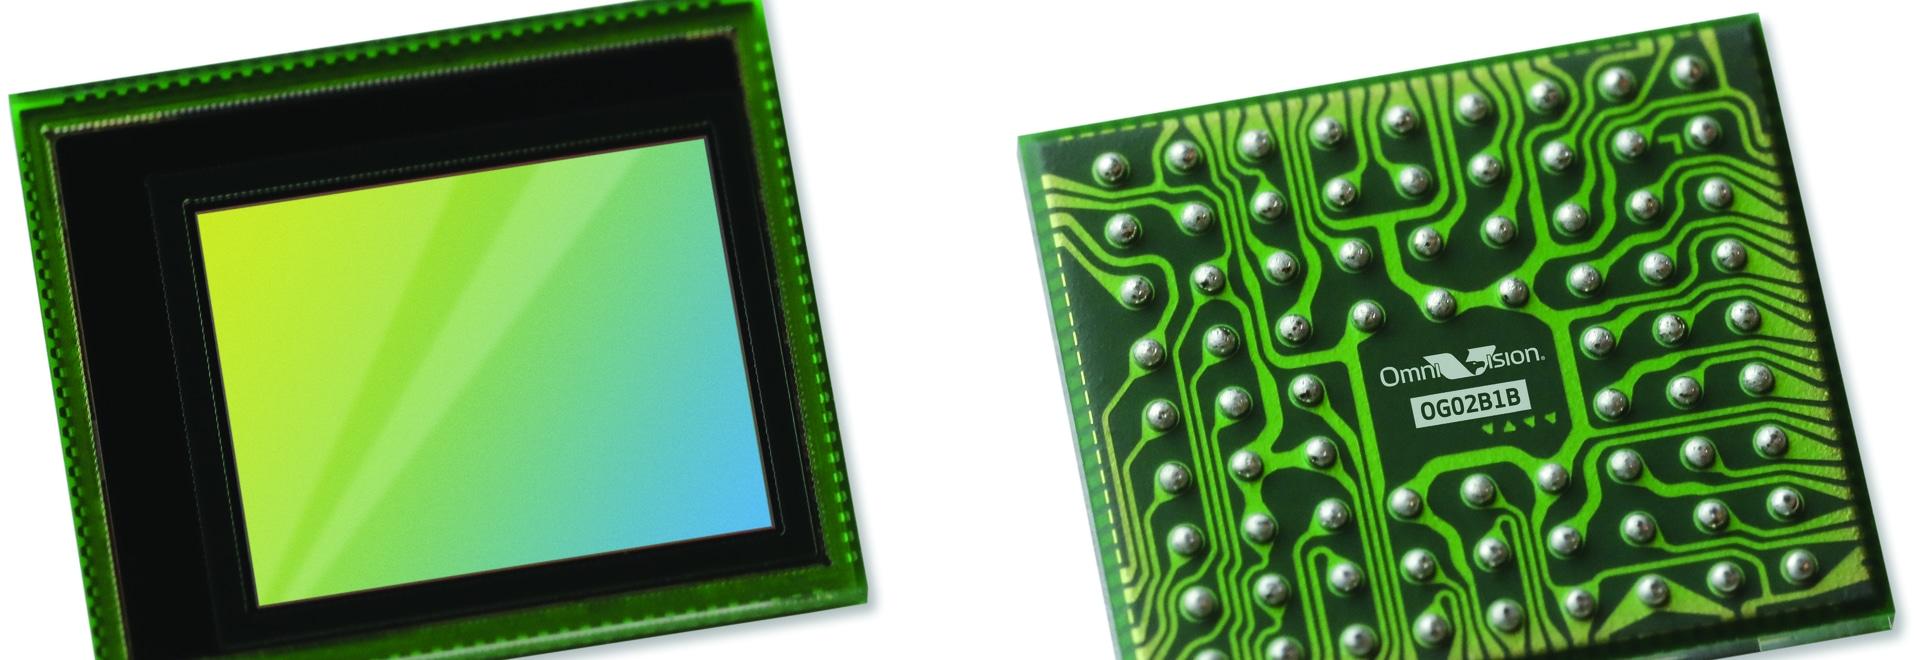 El sensor de imagen permite múltiples funciones en una cámara